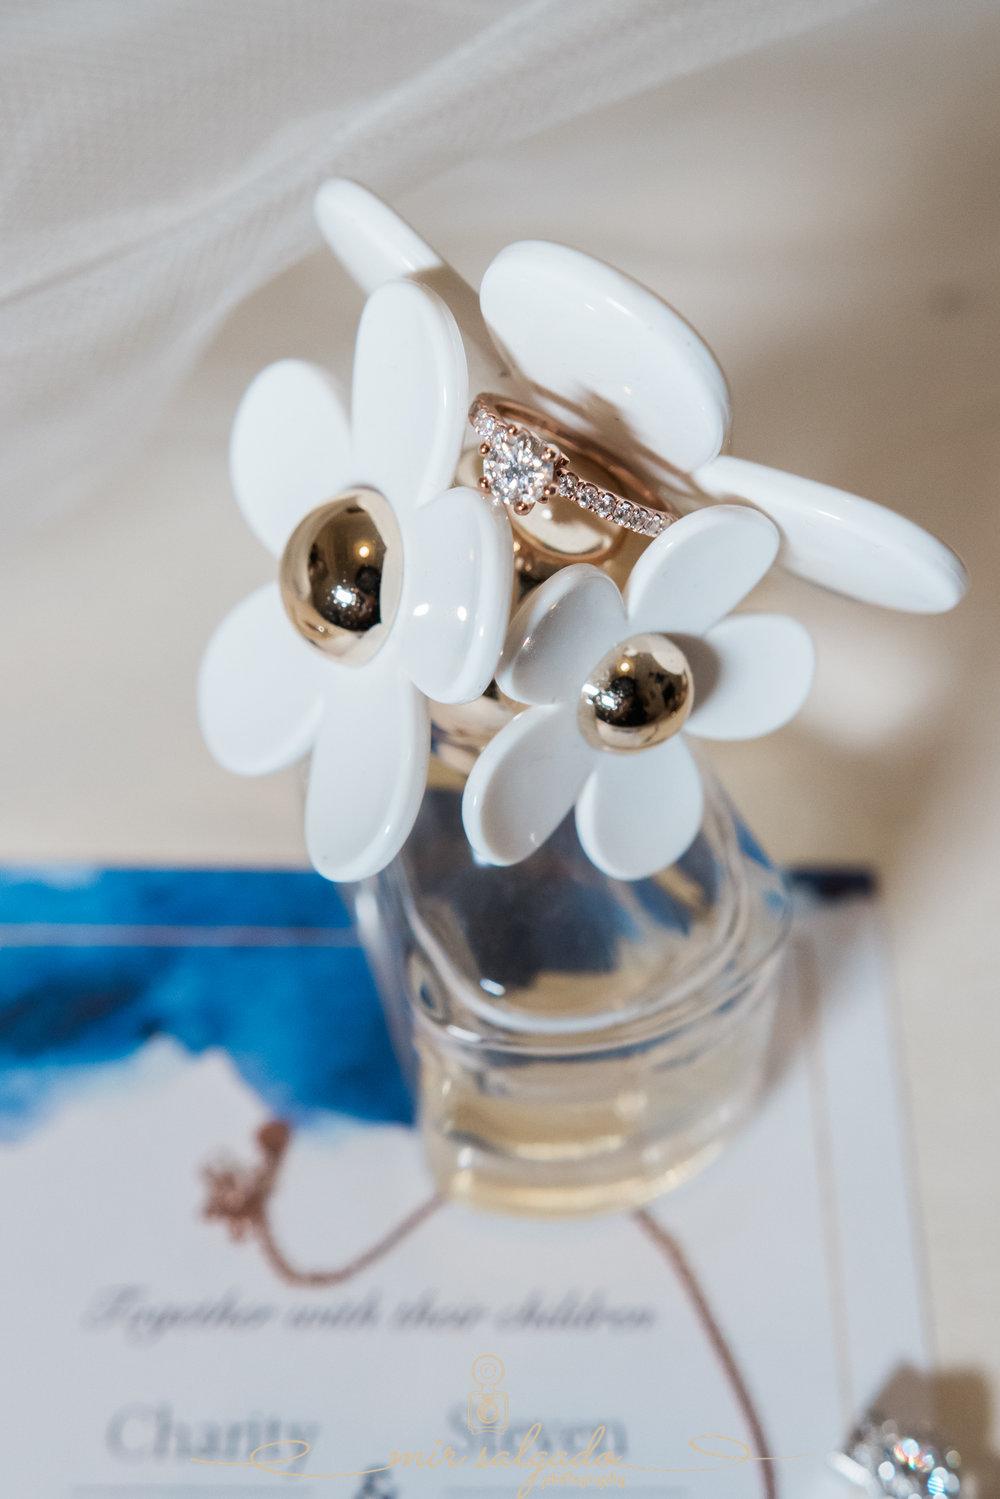 Tampa-wedding-photographer, Tampa-wedding-details-photo